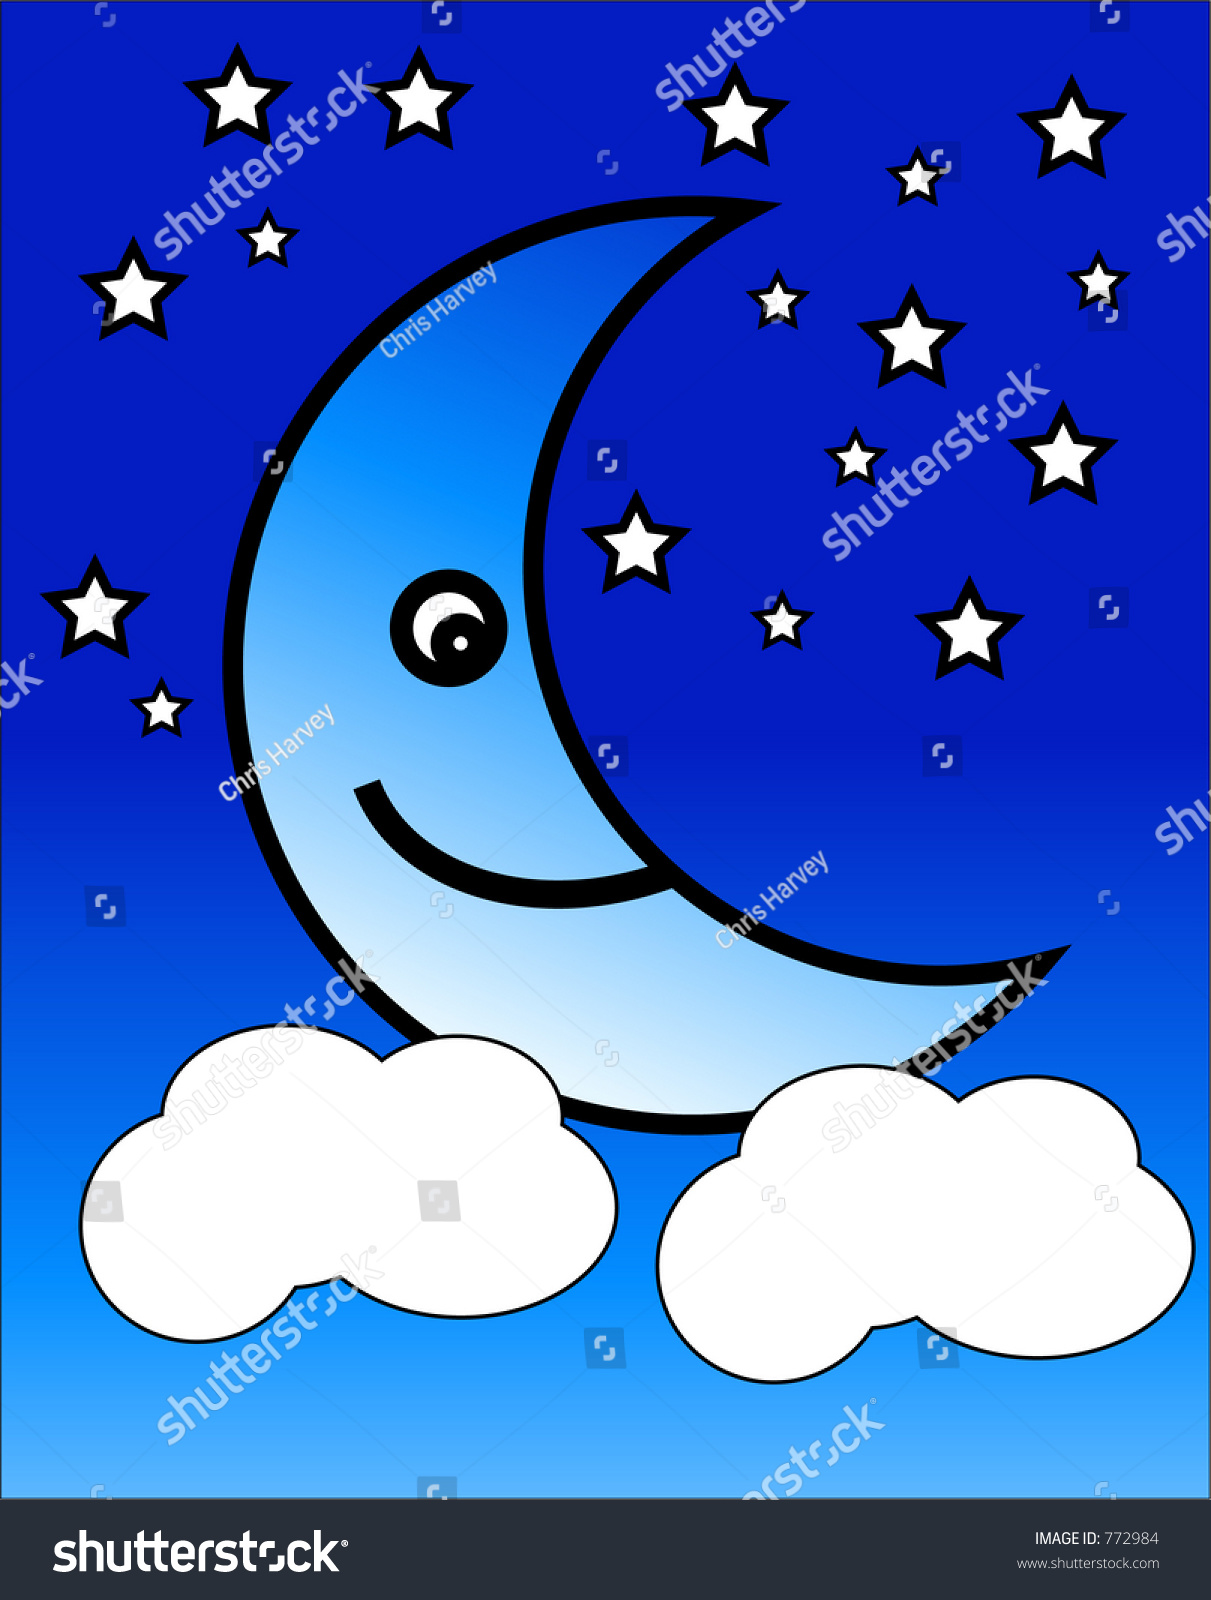 This crescent moon symbol stock illustration 772984 shutterstock this is a crescent moon symbol biocorpaavc Gallery